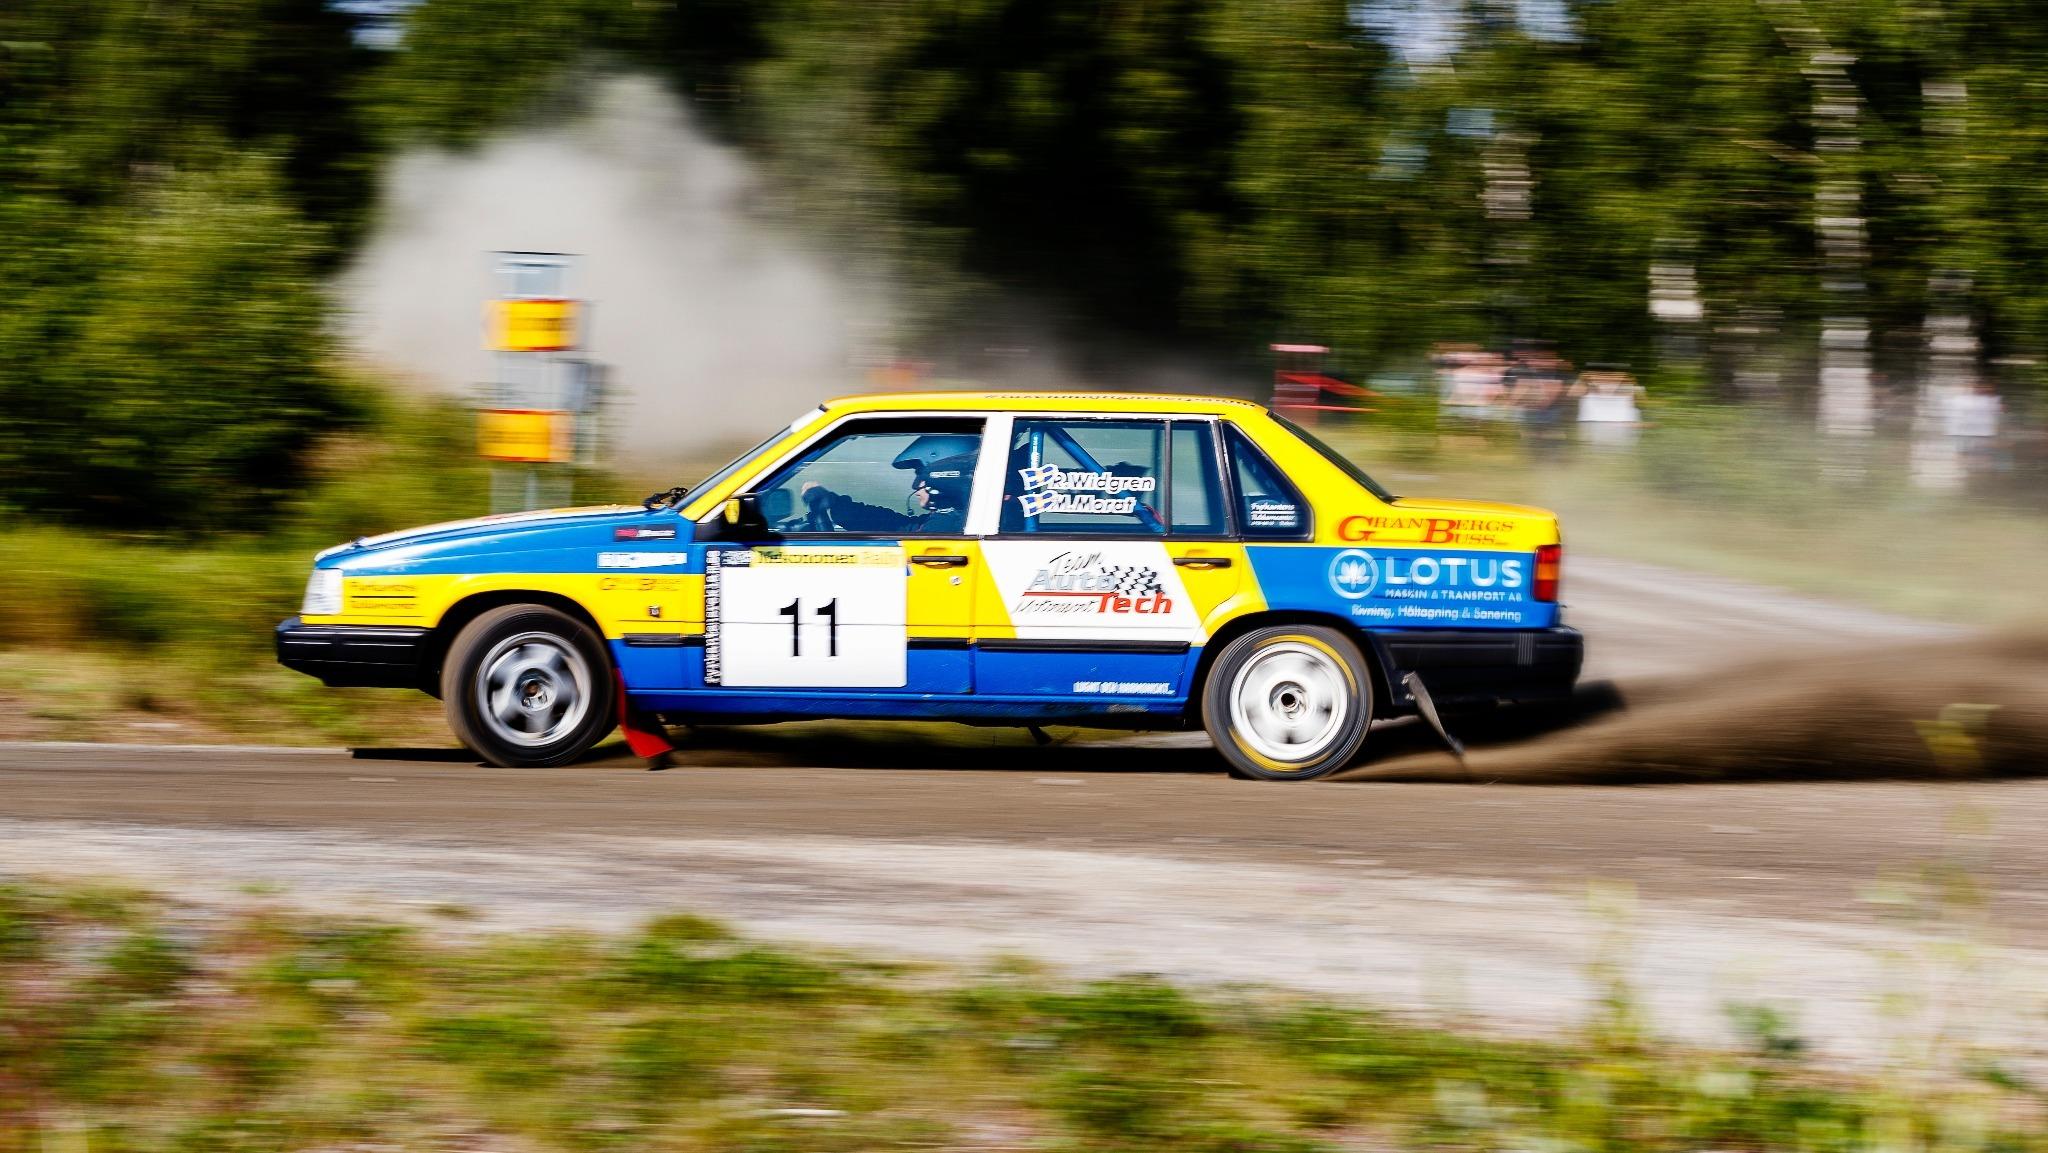 blågul rallybil i full fart